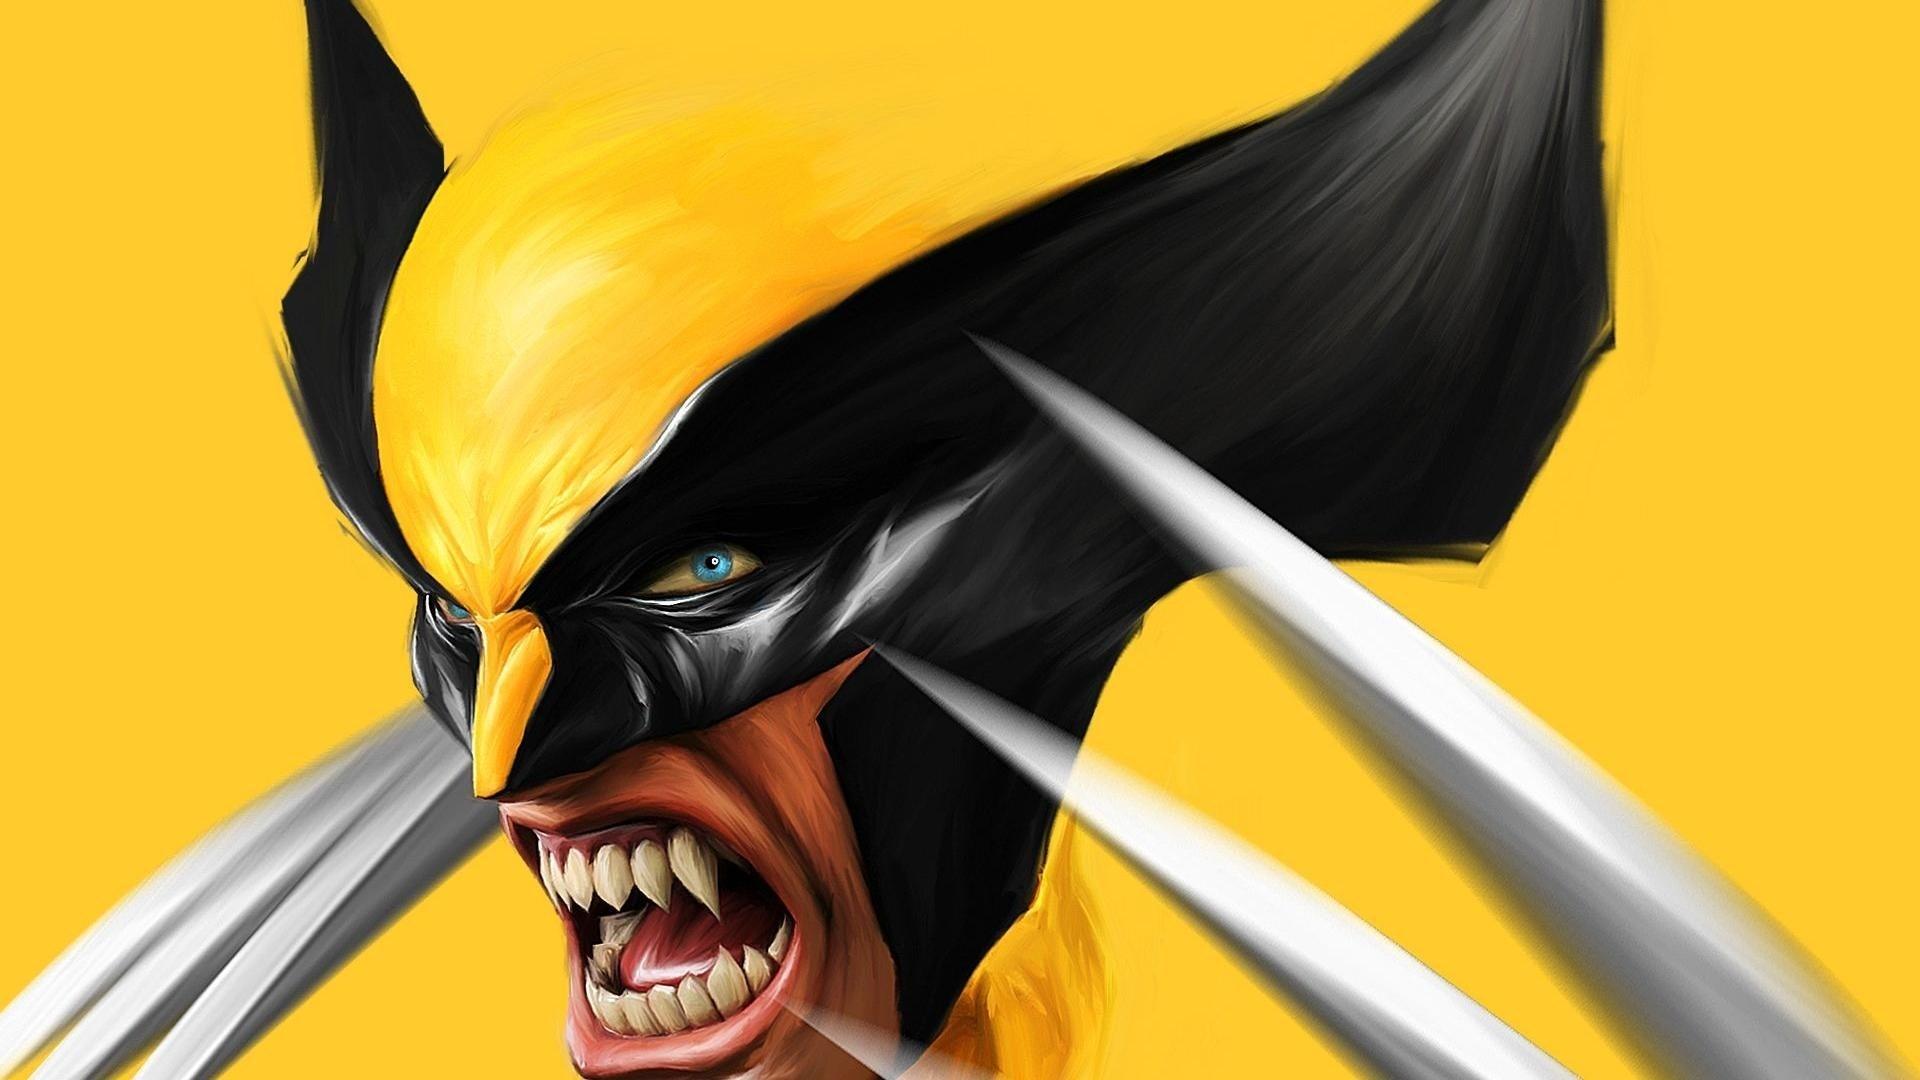 Wolverine Wallpaper image hd